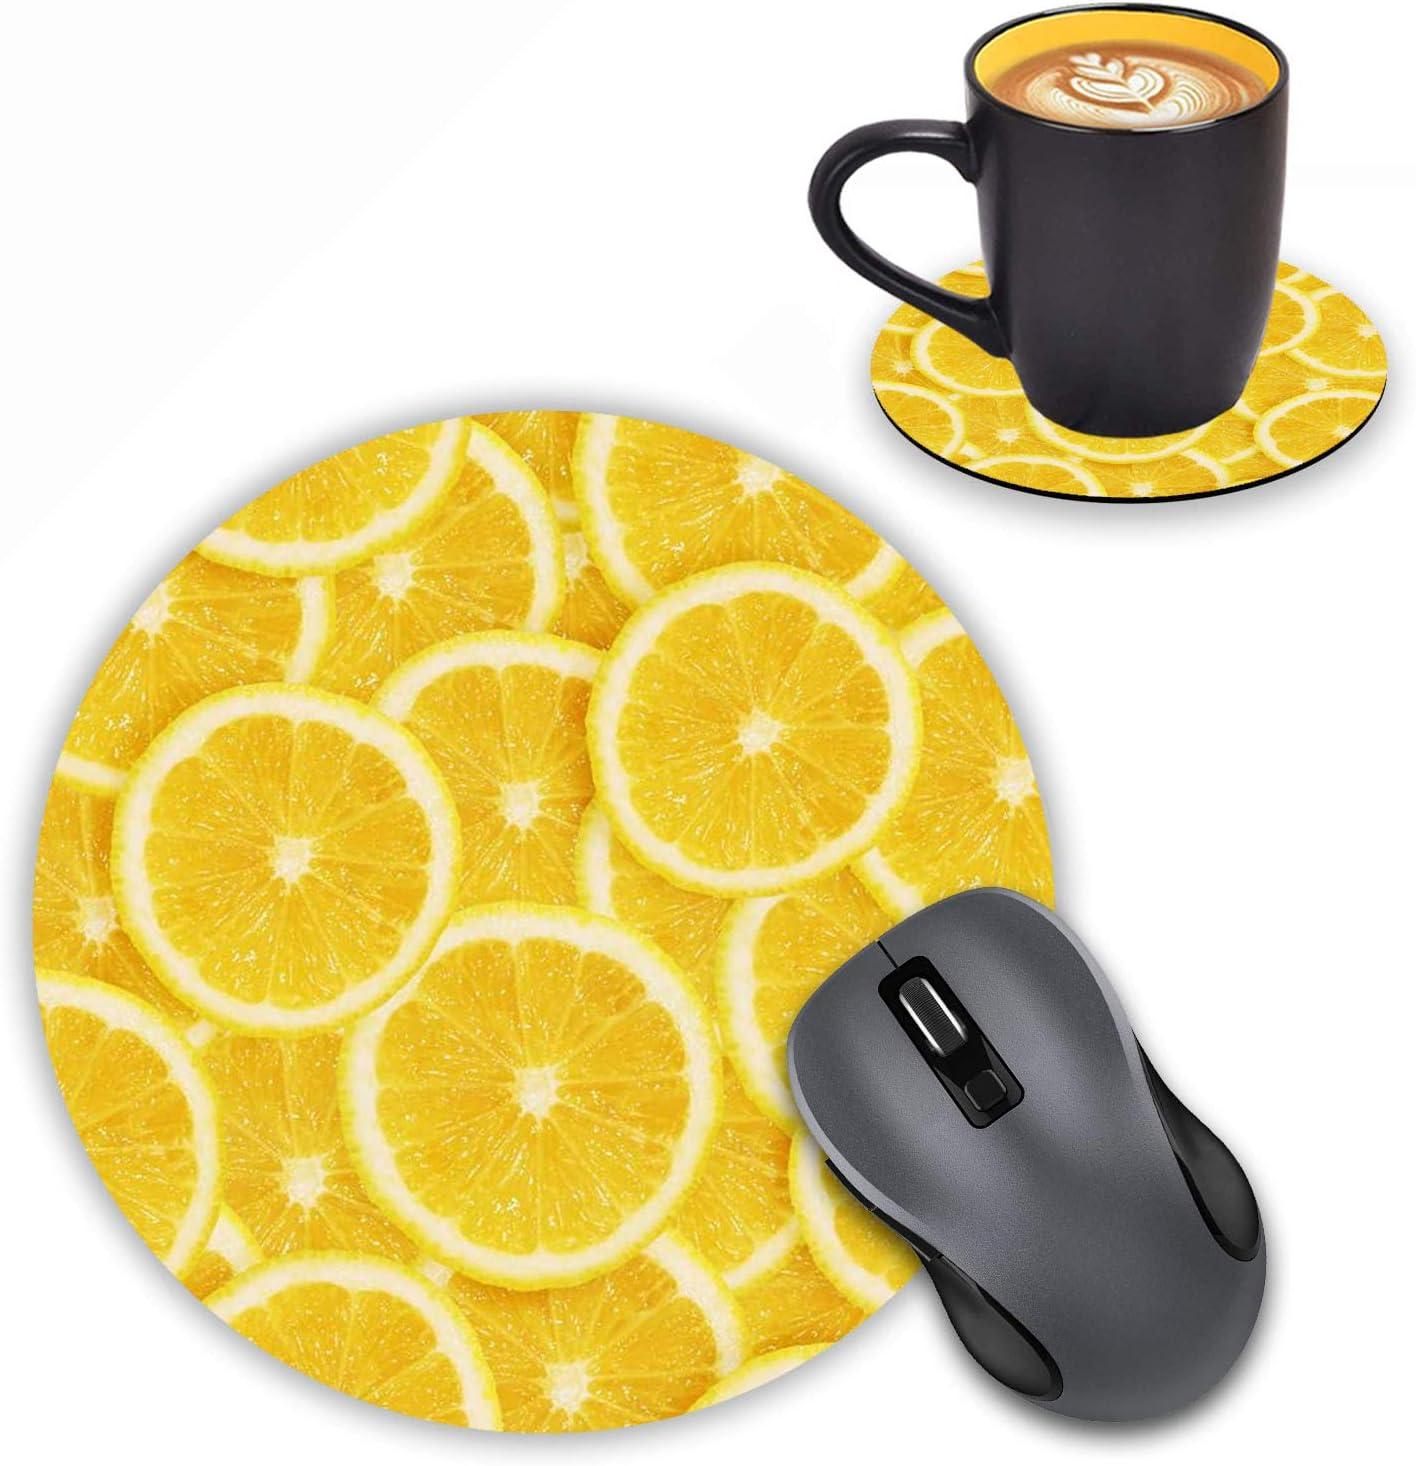 LOWORO Round Mouse Pad with Coasters Set, Lemon Slices Design Mouse Pad Non-Slip Rubber Mousepad Office Accessories Desk Decor Mouse Pads for Computers Laptop